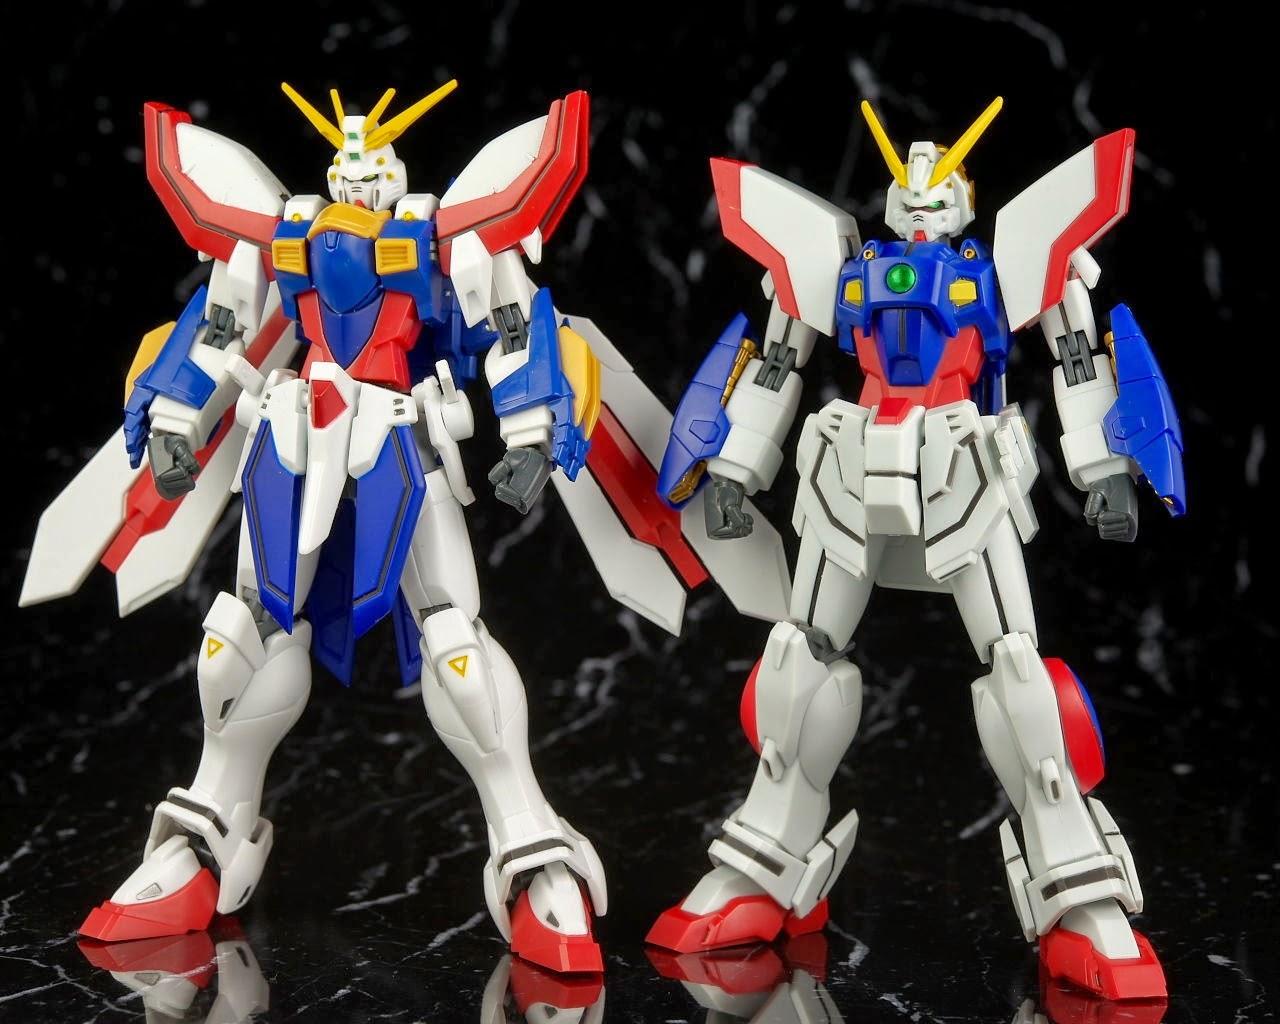 Gundam Family Robot Spirits Side Ms Shining Gundam Review